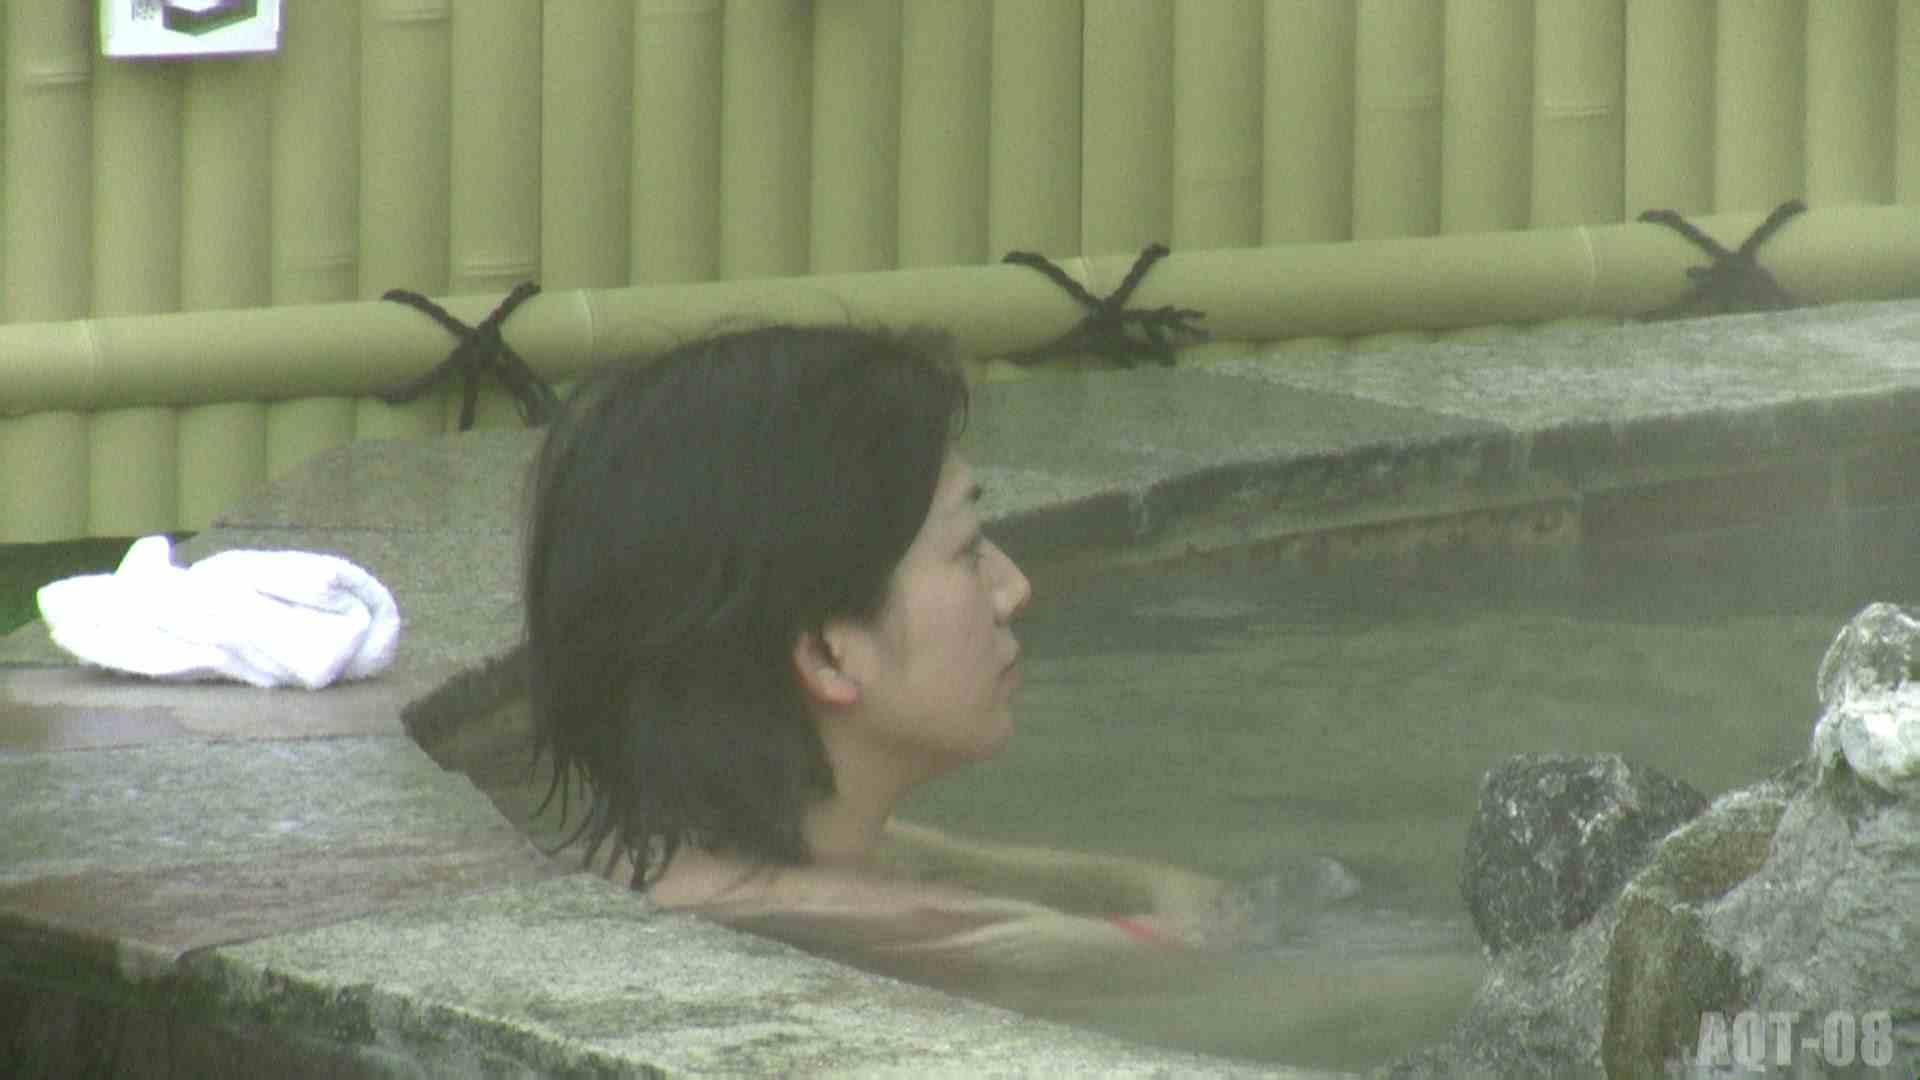 Aquaな露天風呂Vol.776 盗撮 エロ無料画像 108画像 98